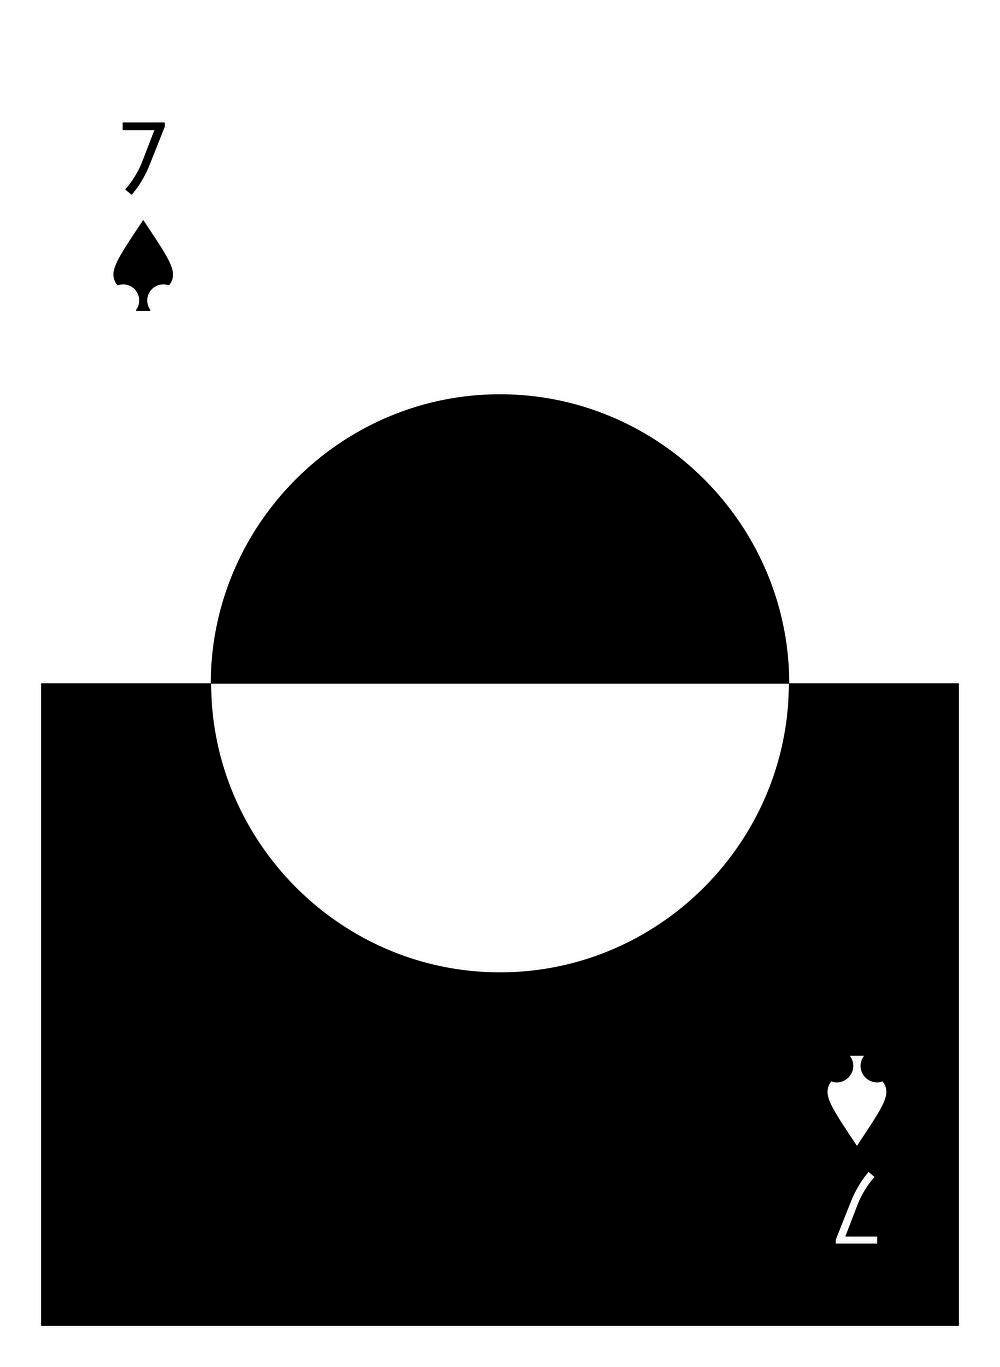 52_2__0006_Spades_7.jpg